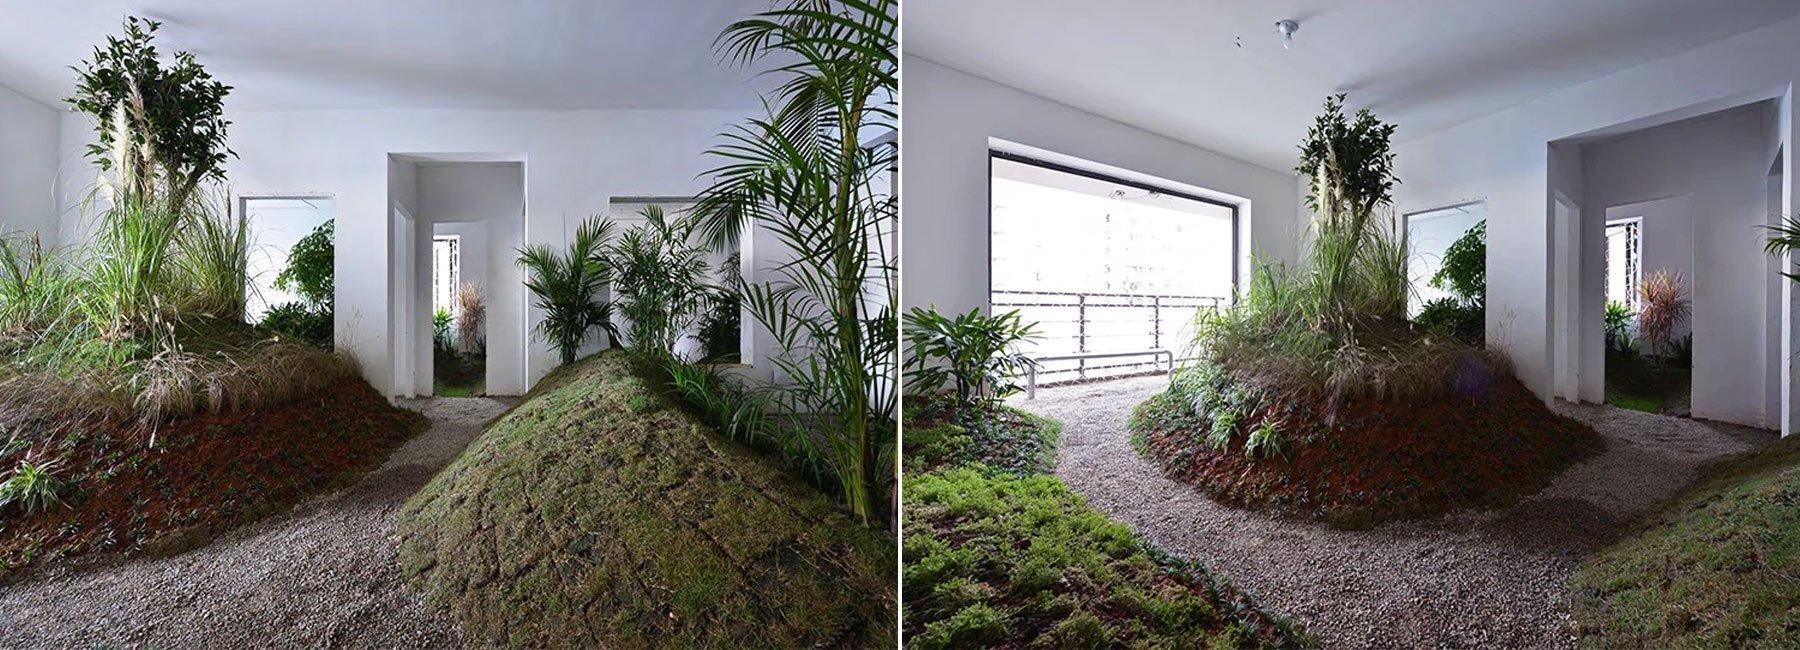 Дизайнери перетворили квартиру на парк